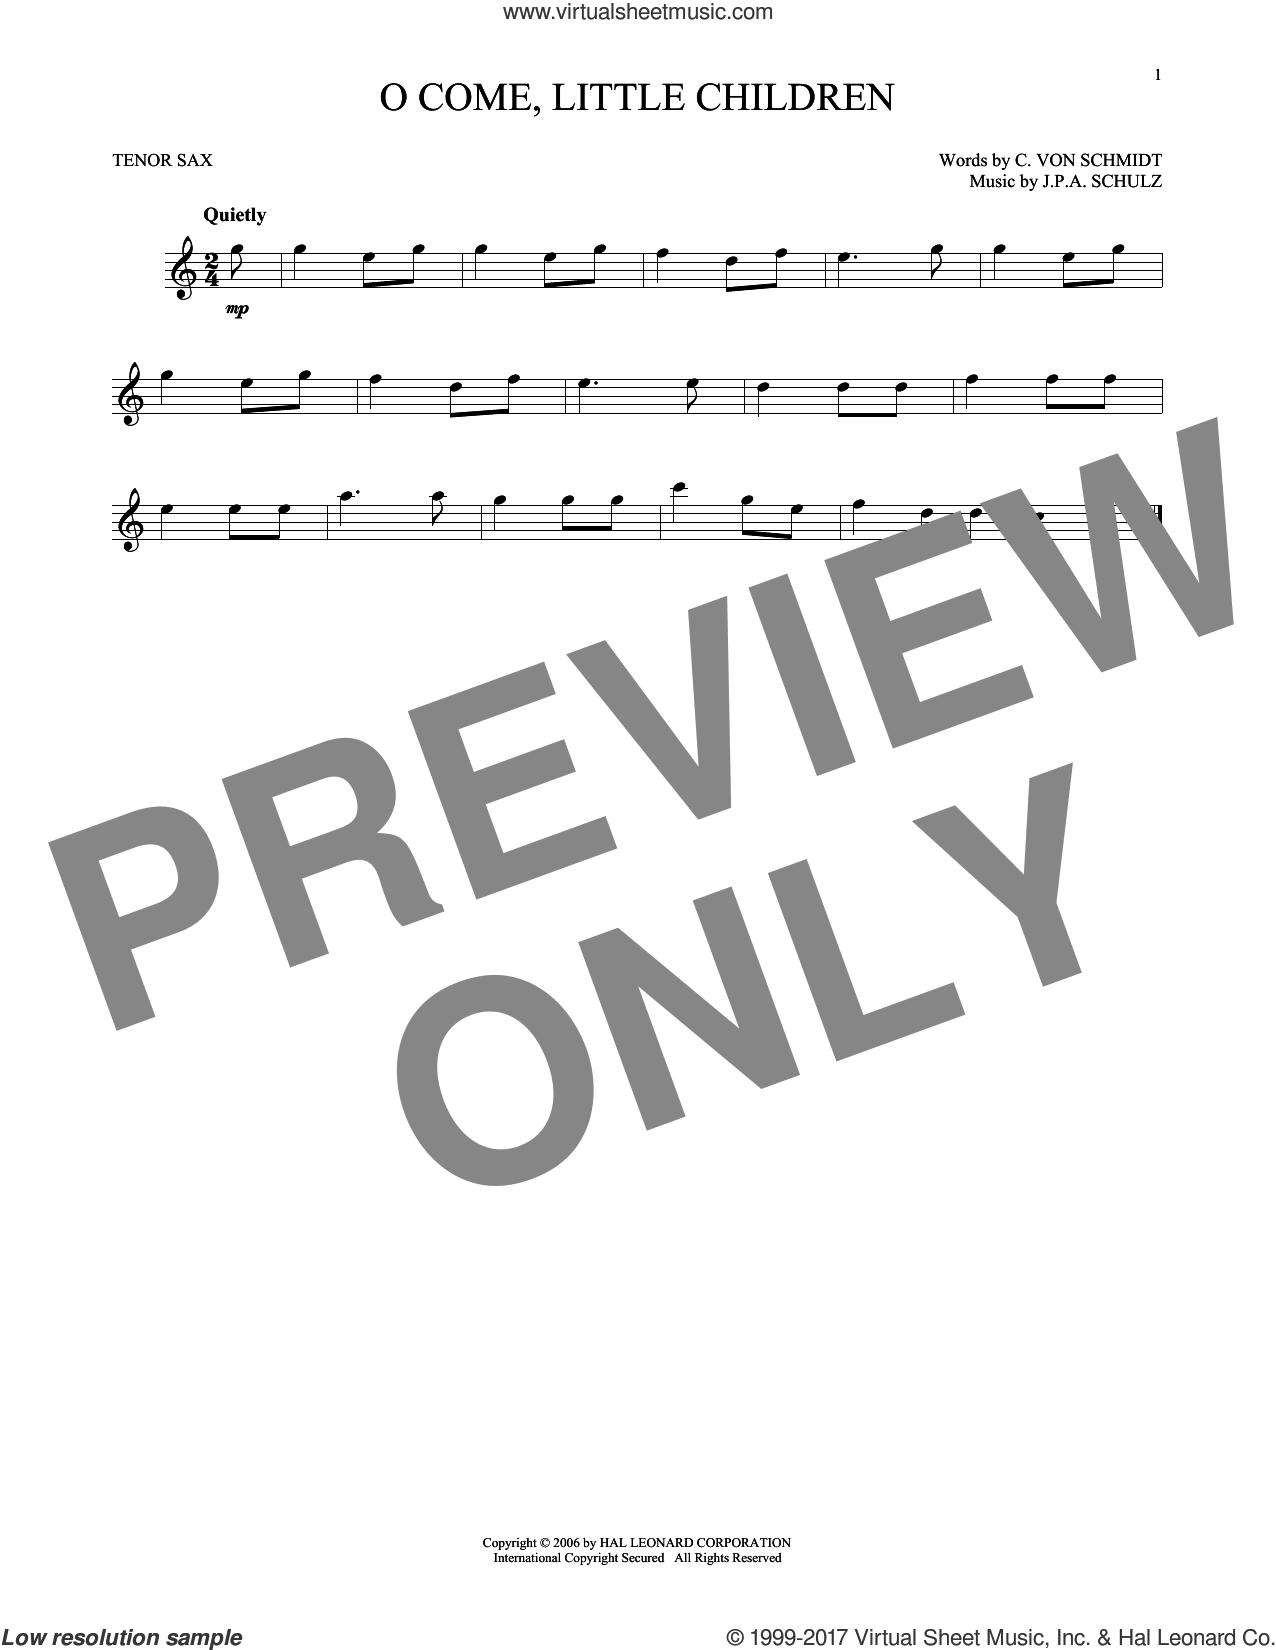 O Come, Little Children sheet music for tenor saxophone solo by J.A.P. Schulz and Cristoph Von Schmid, intermediate skill level